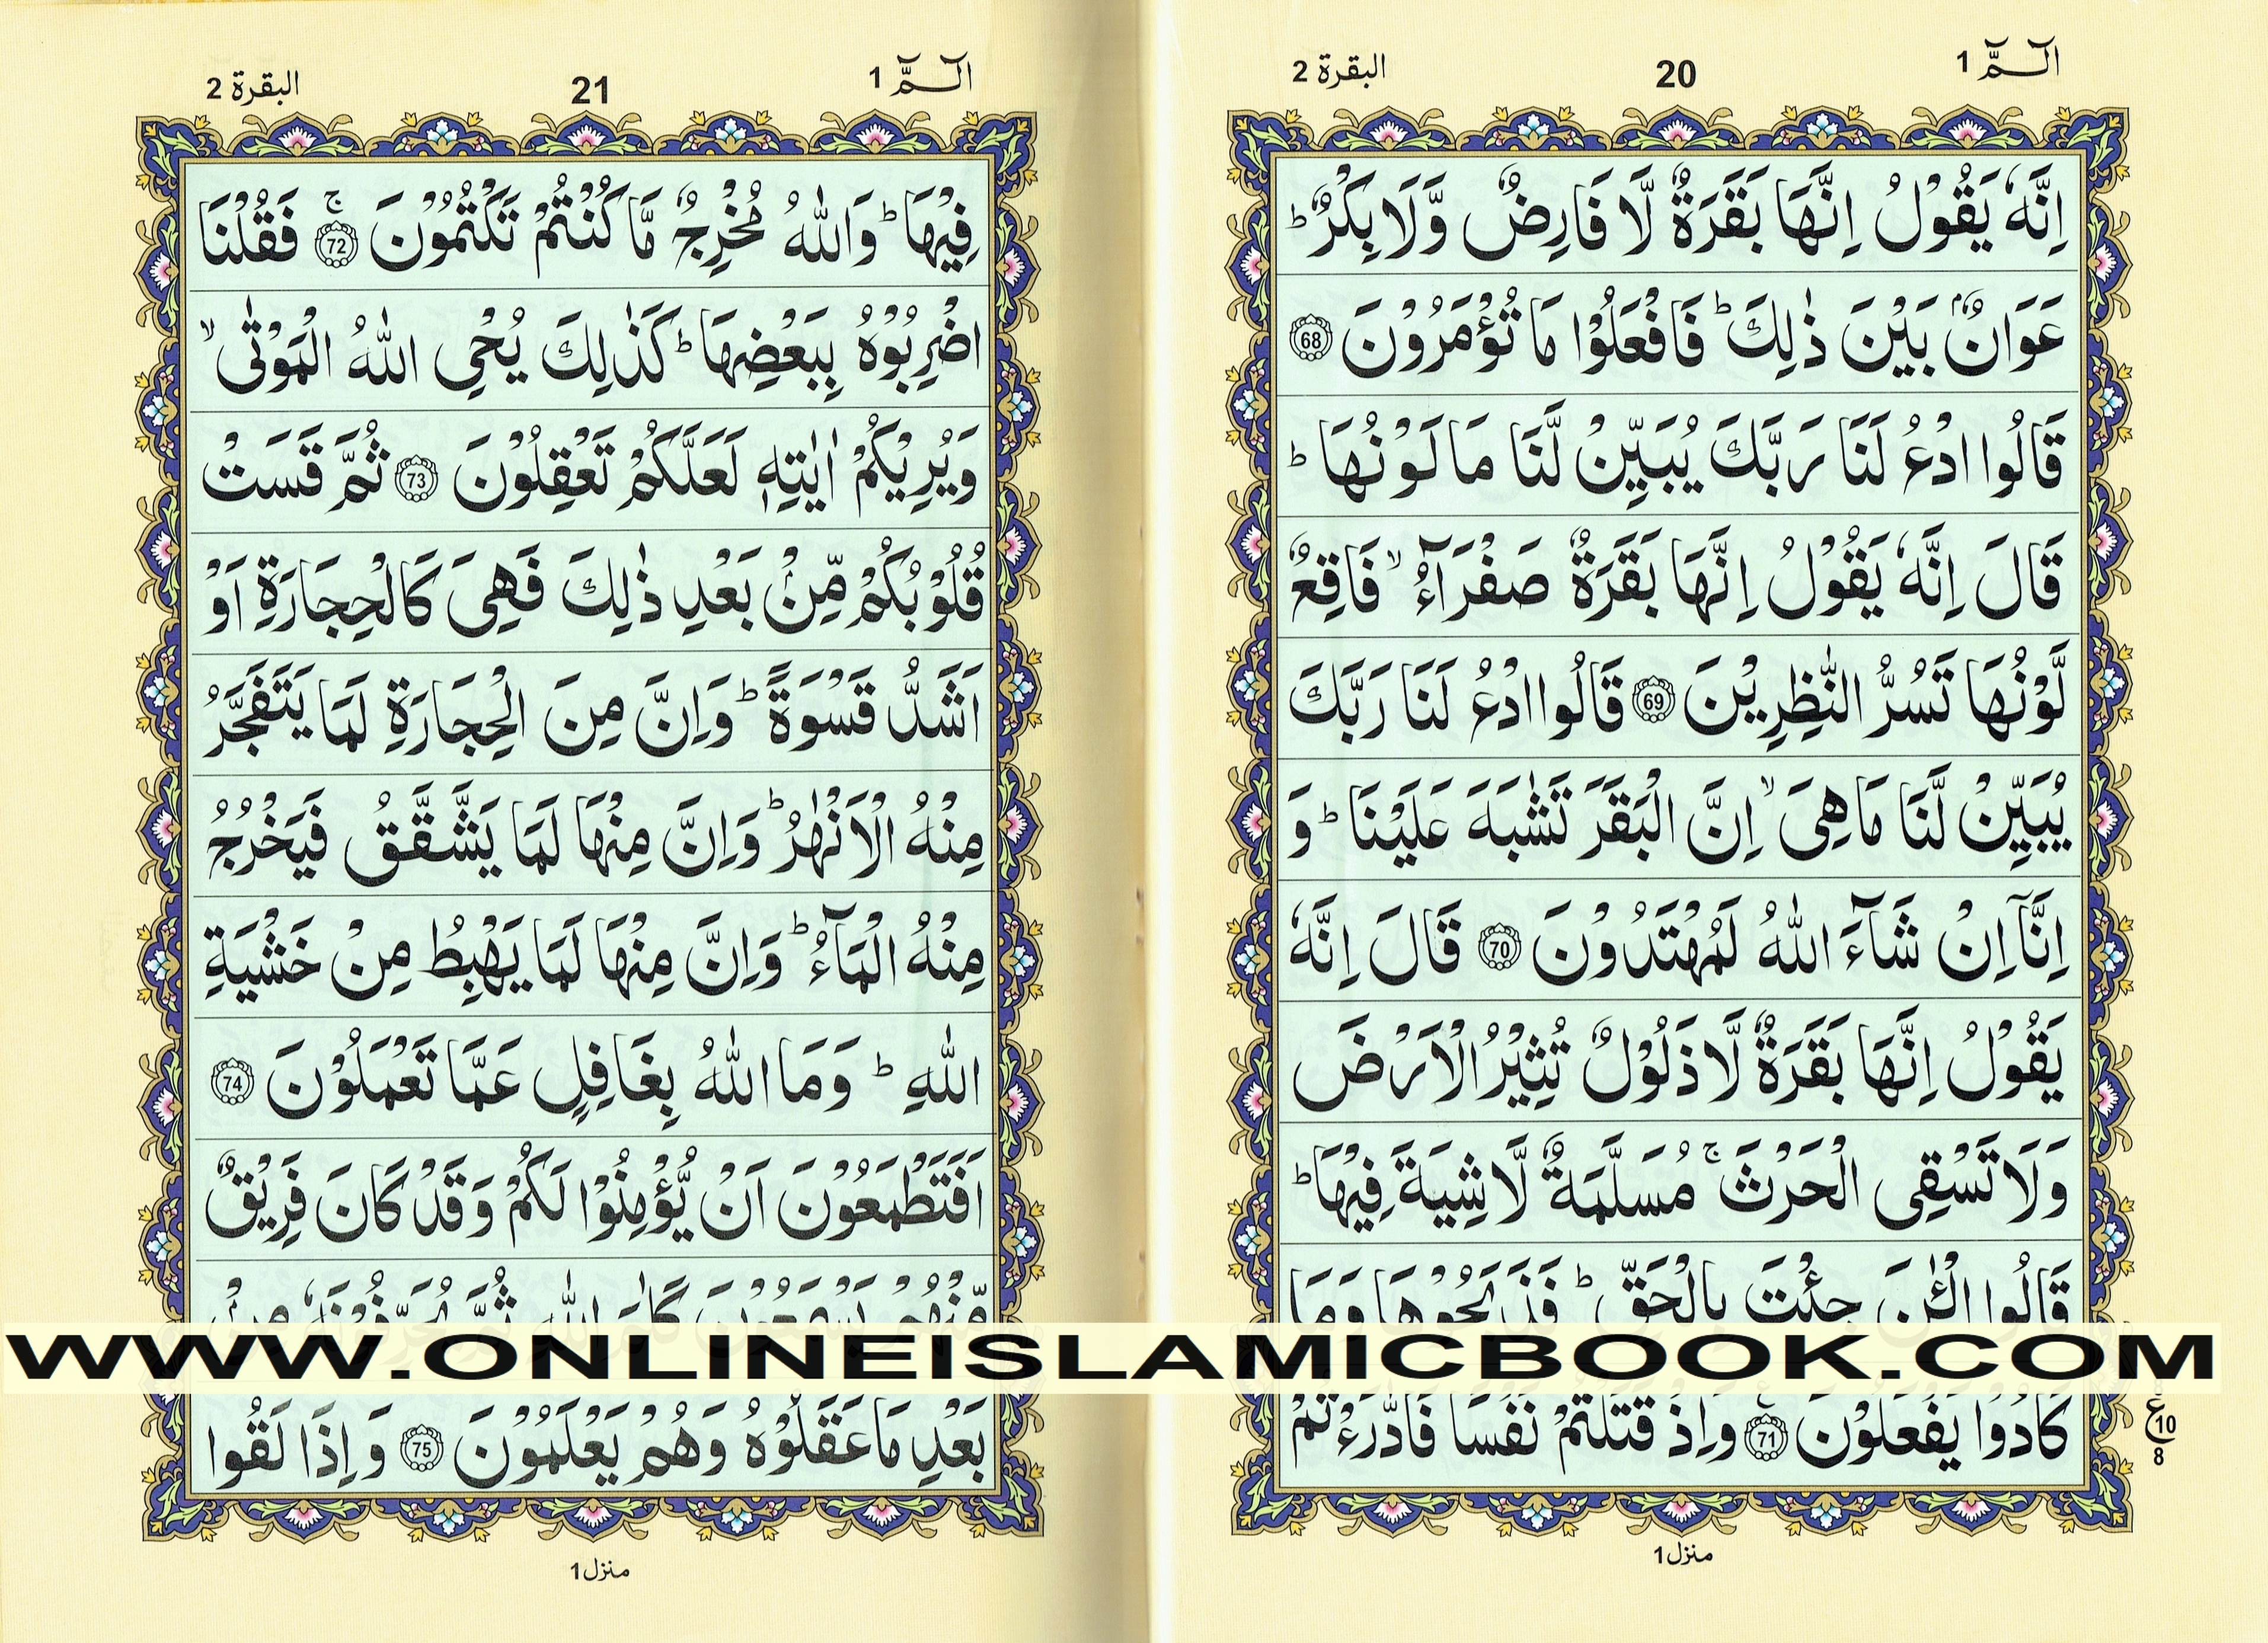 -quran-al-kareem-arabic-only-11-lines-pakistani-indian-persian-script-large-words-ref-92-4-.jpg